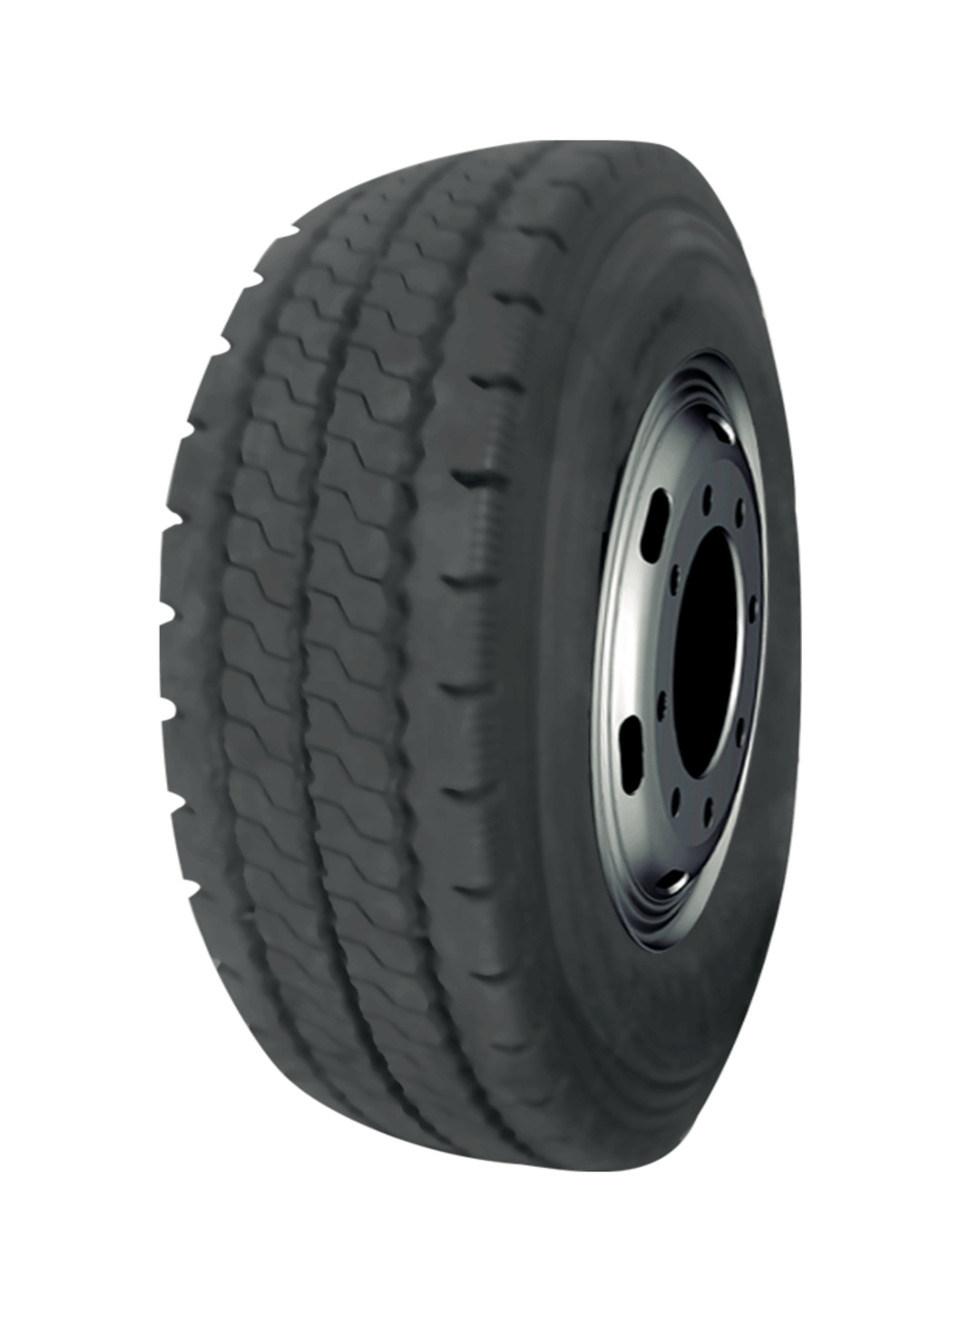 All Steel OTR Trailer Radial TBR Truck and Bus Tyre